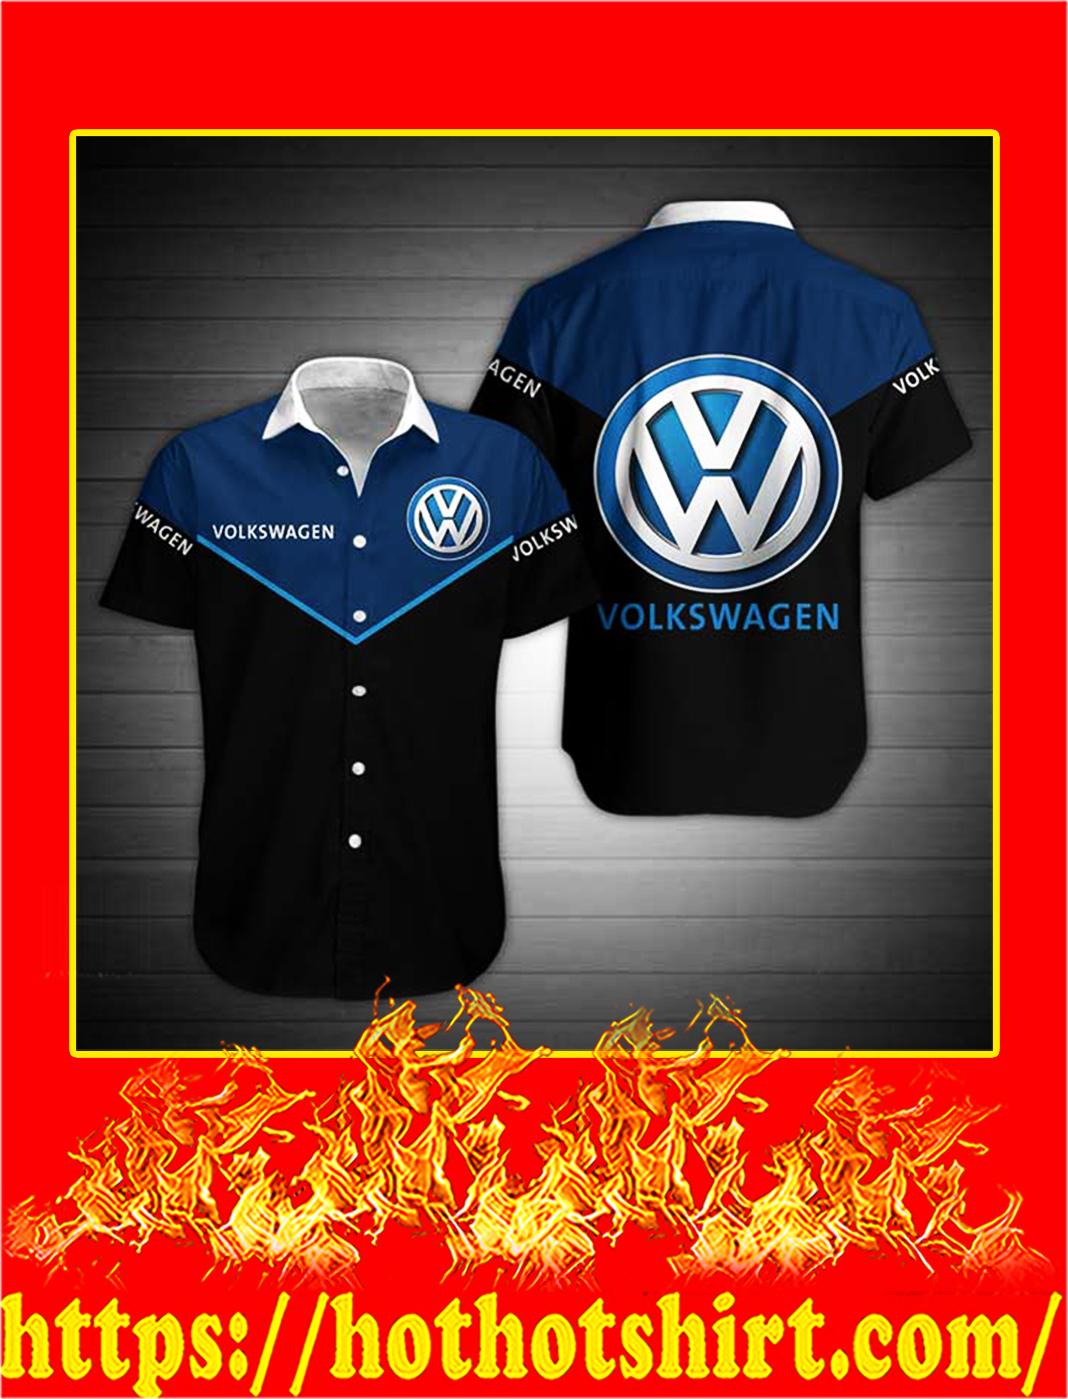 Volkswagen hawaiian shirt - L